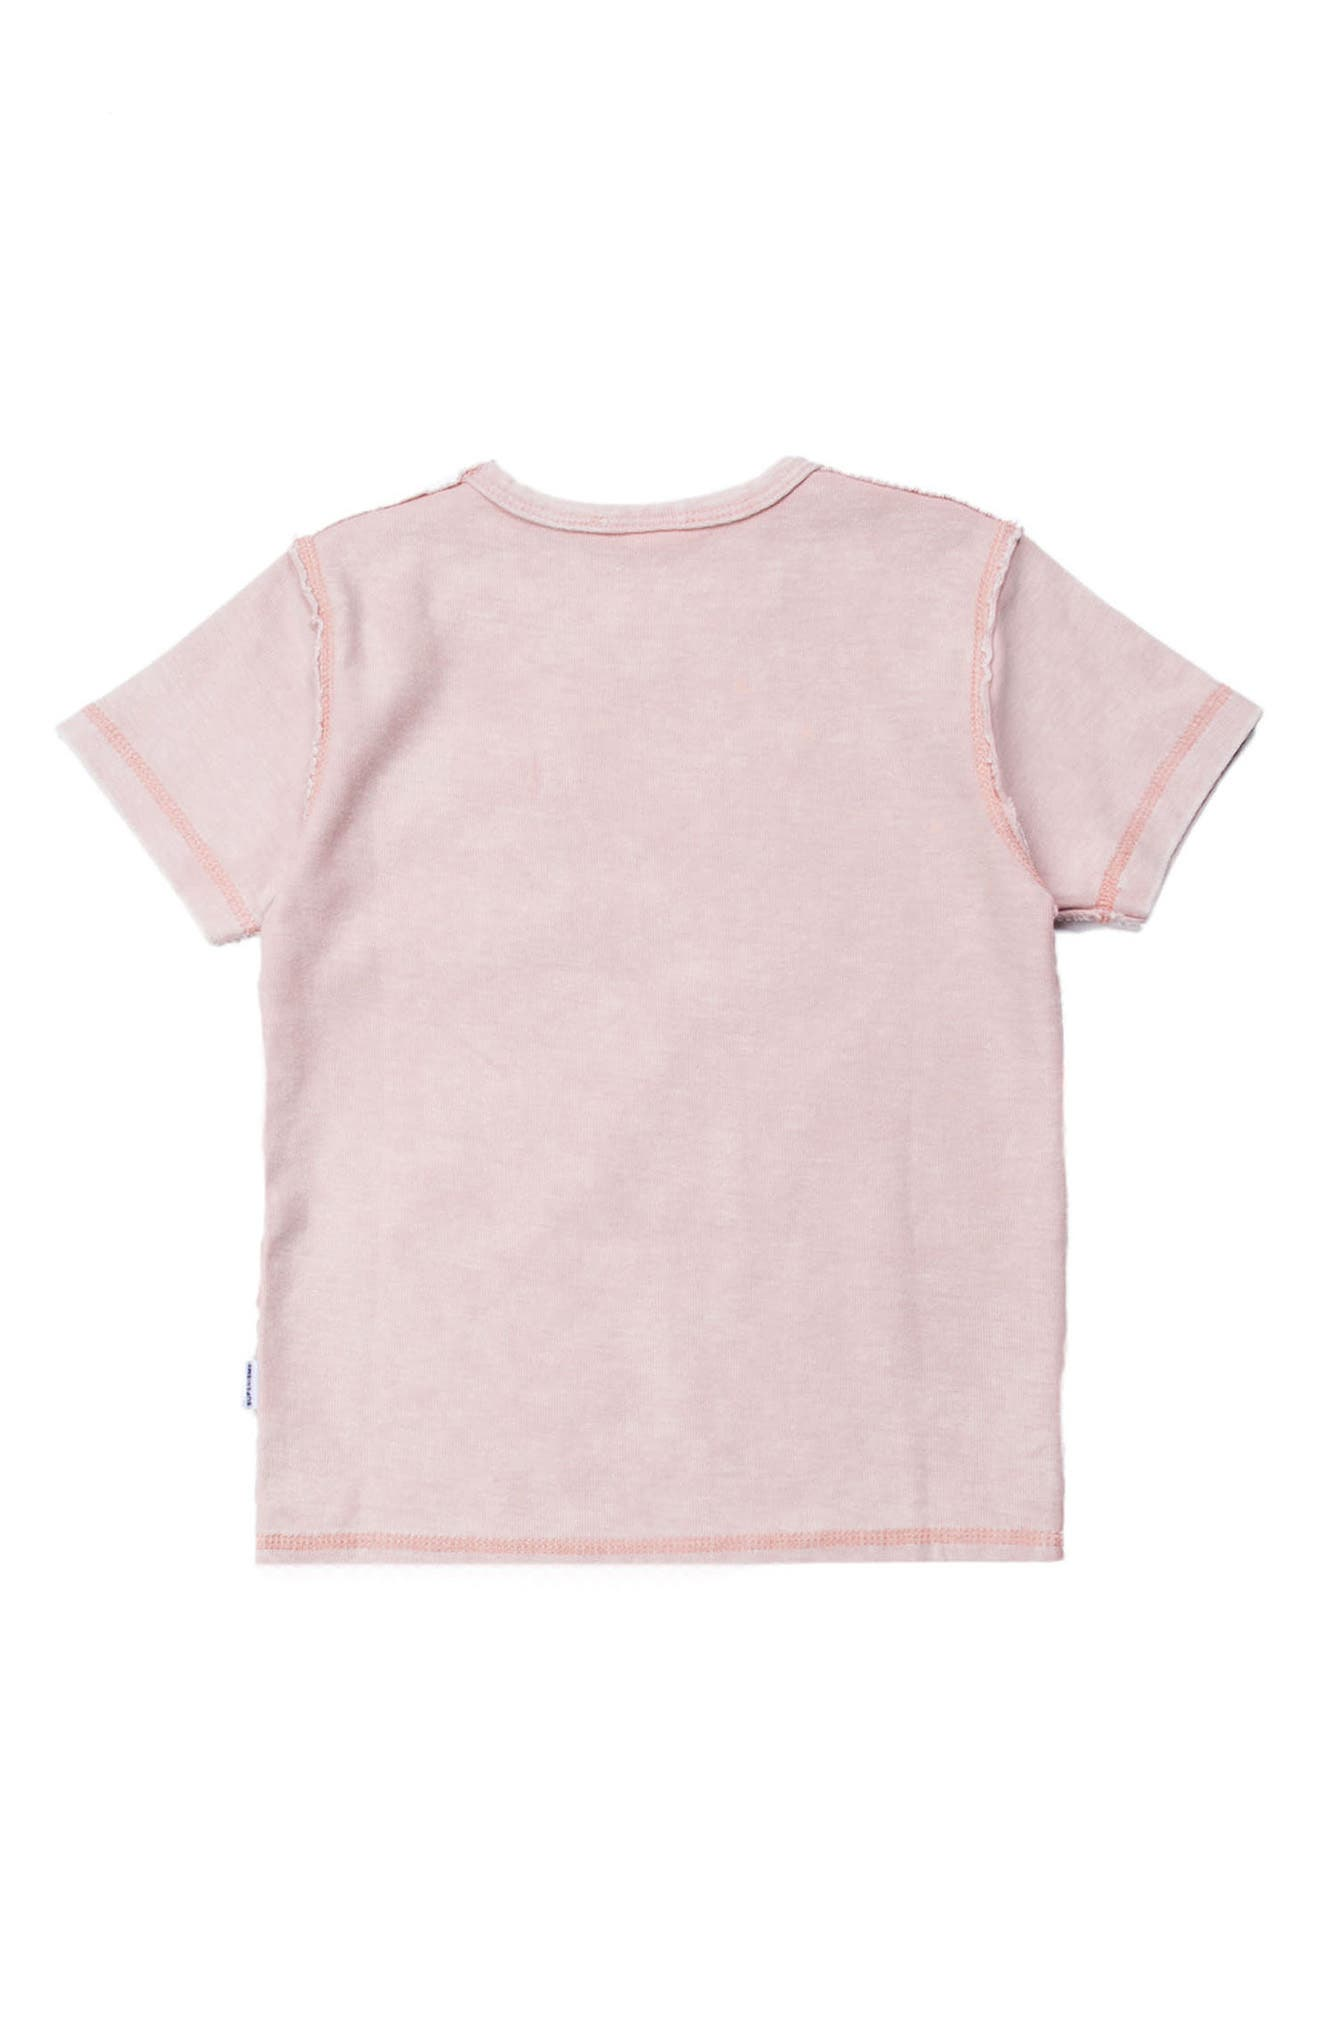 Emery Pocket T-Shirt,                             Alternate thumbnail 2, color,                             Pink